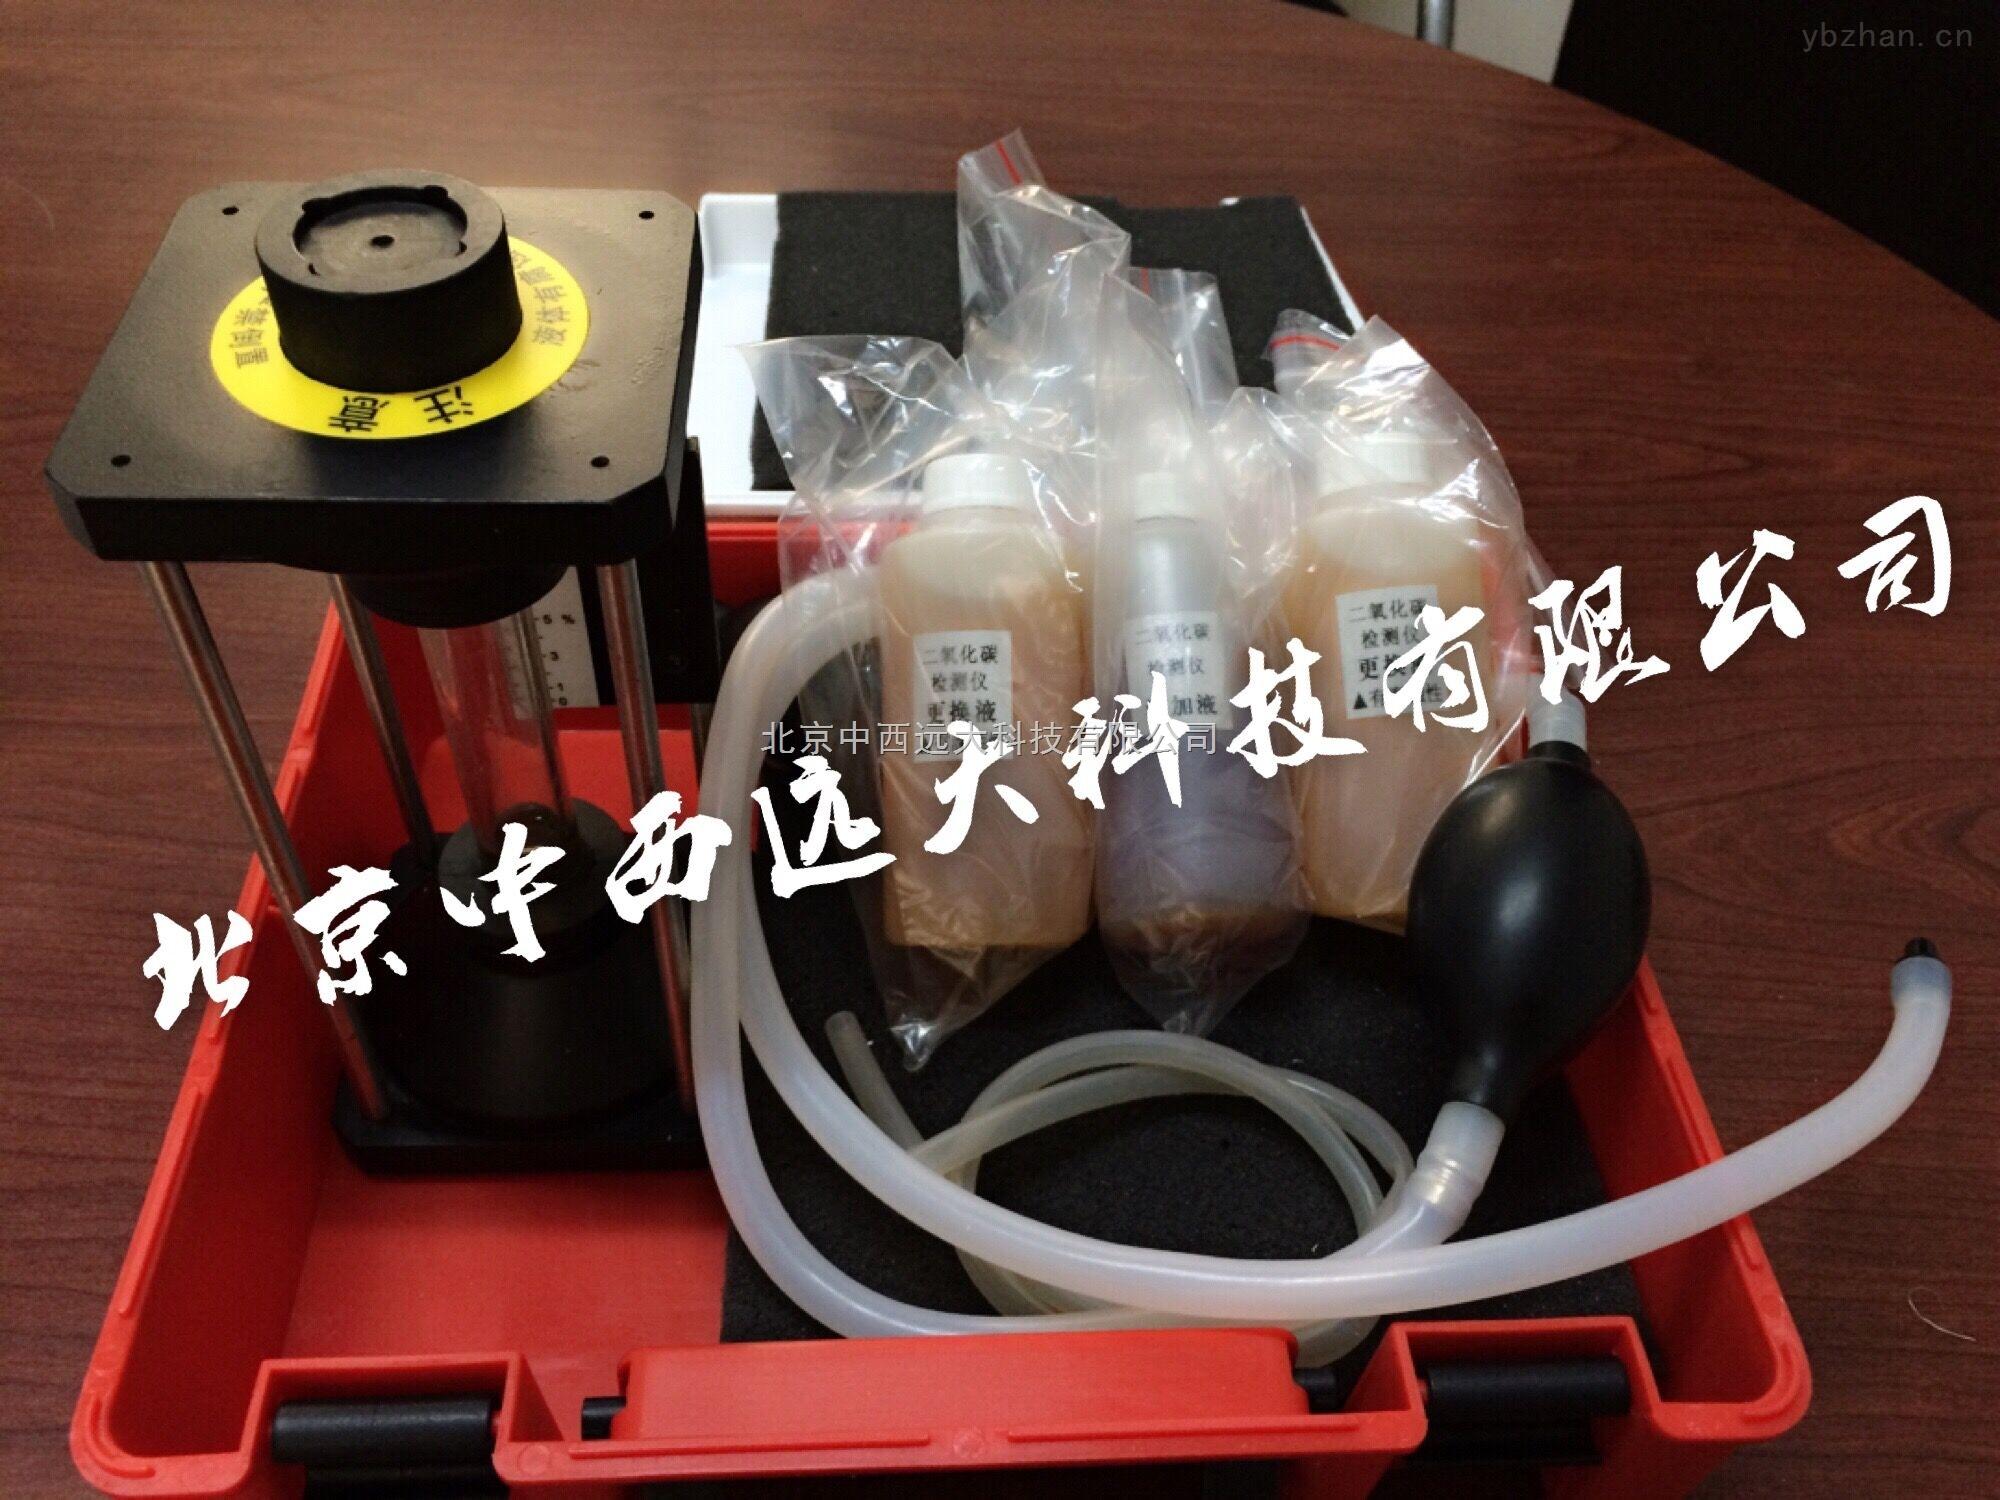 M286968-培养箱二氧化碳浓度检测仪(国产0-12%) 型号:M286968